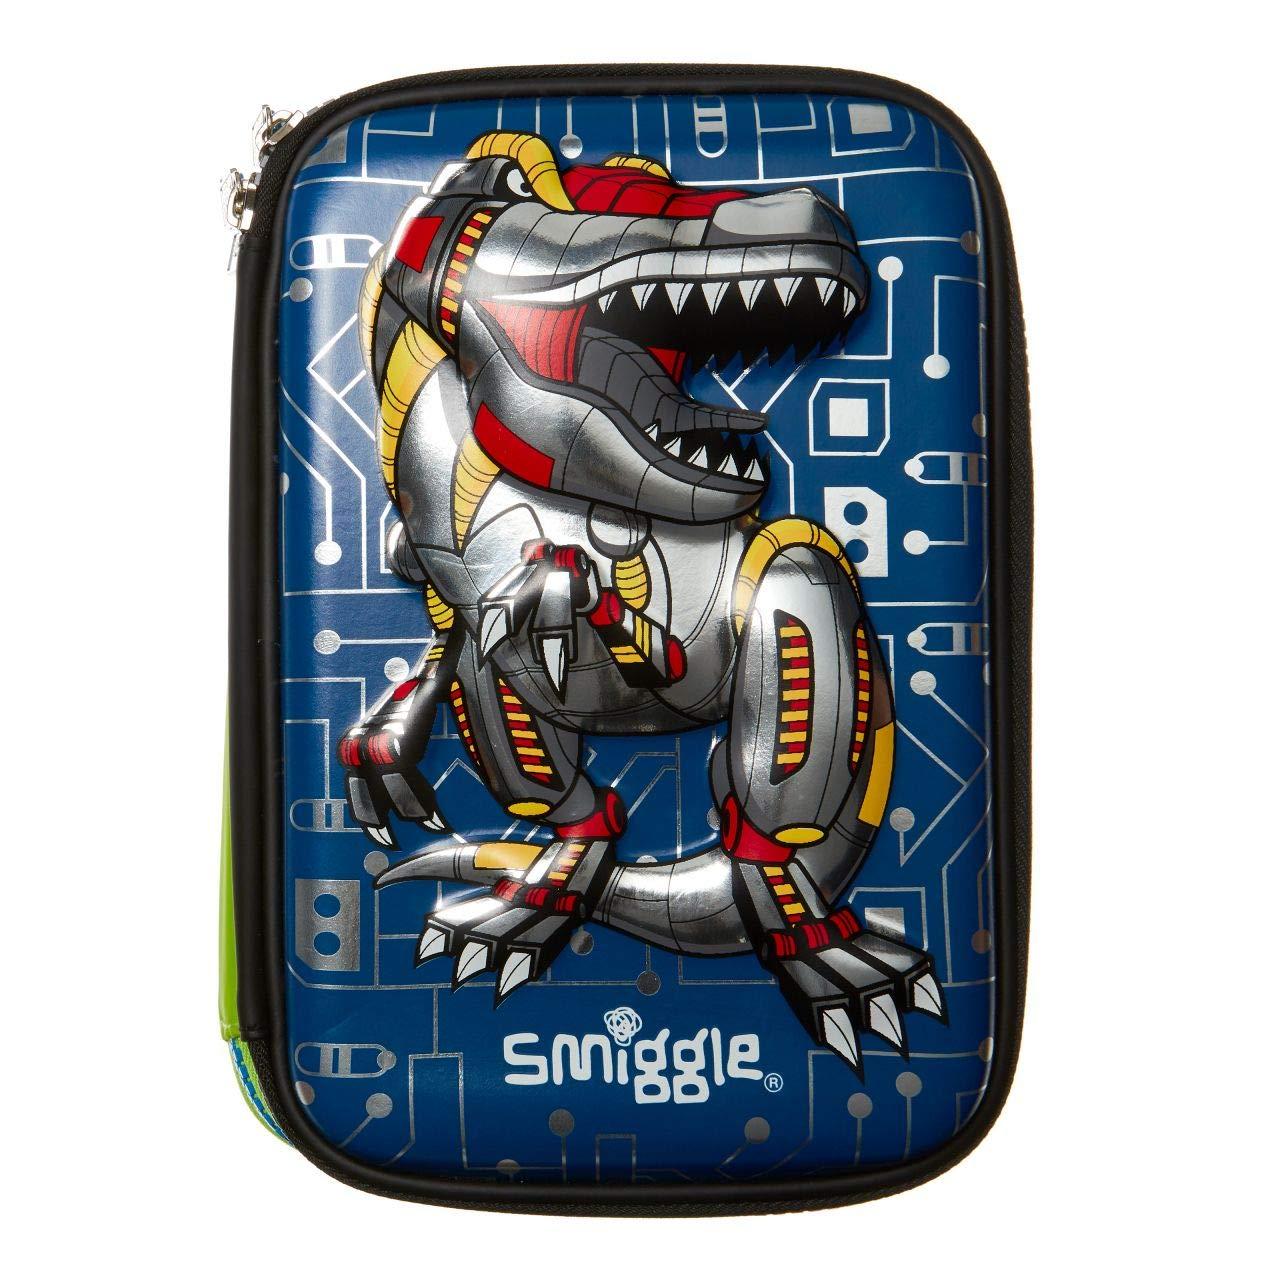 Pencil Bag,Dinosaur Pencil case for Preschool Students Boys Girls